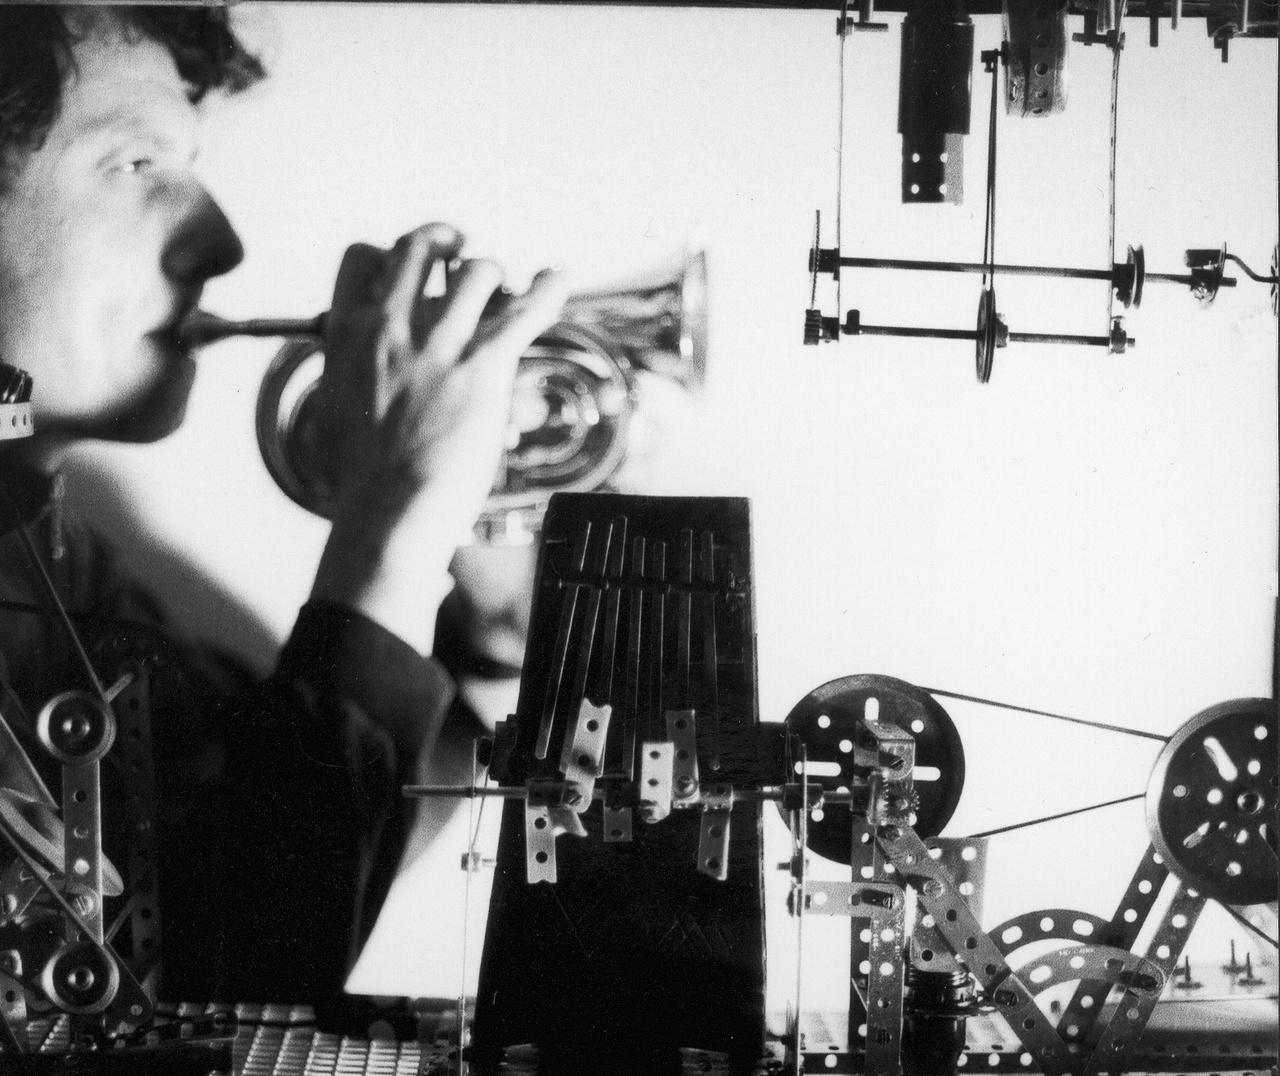 Pierre Bastien - The Mechanical Wizard